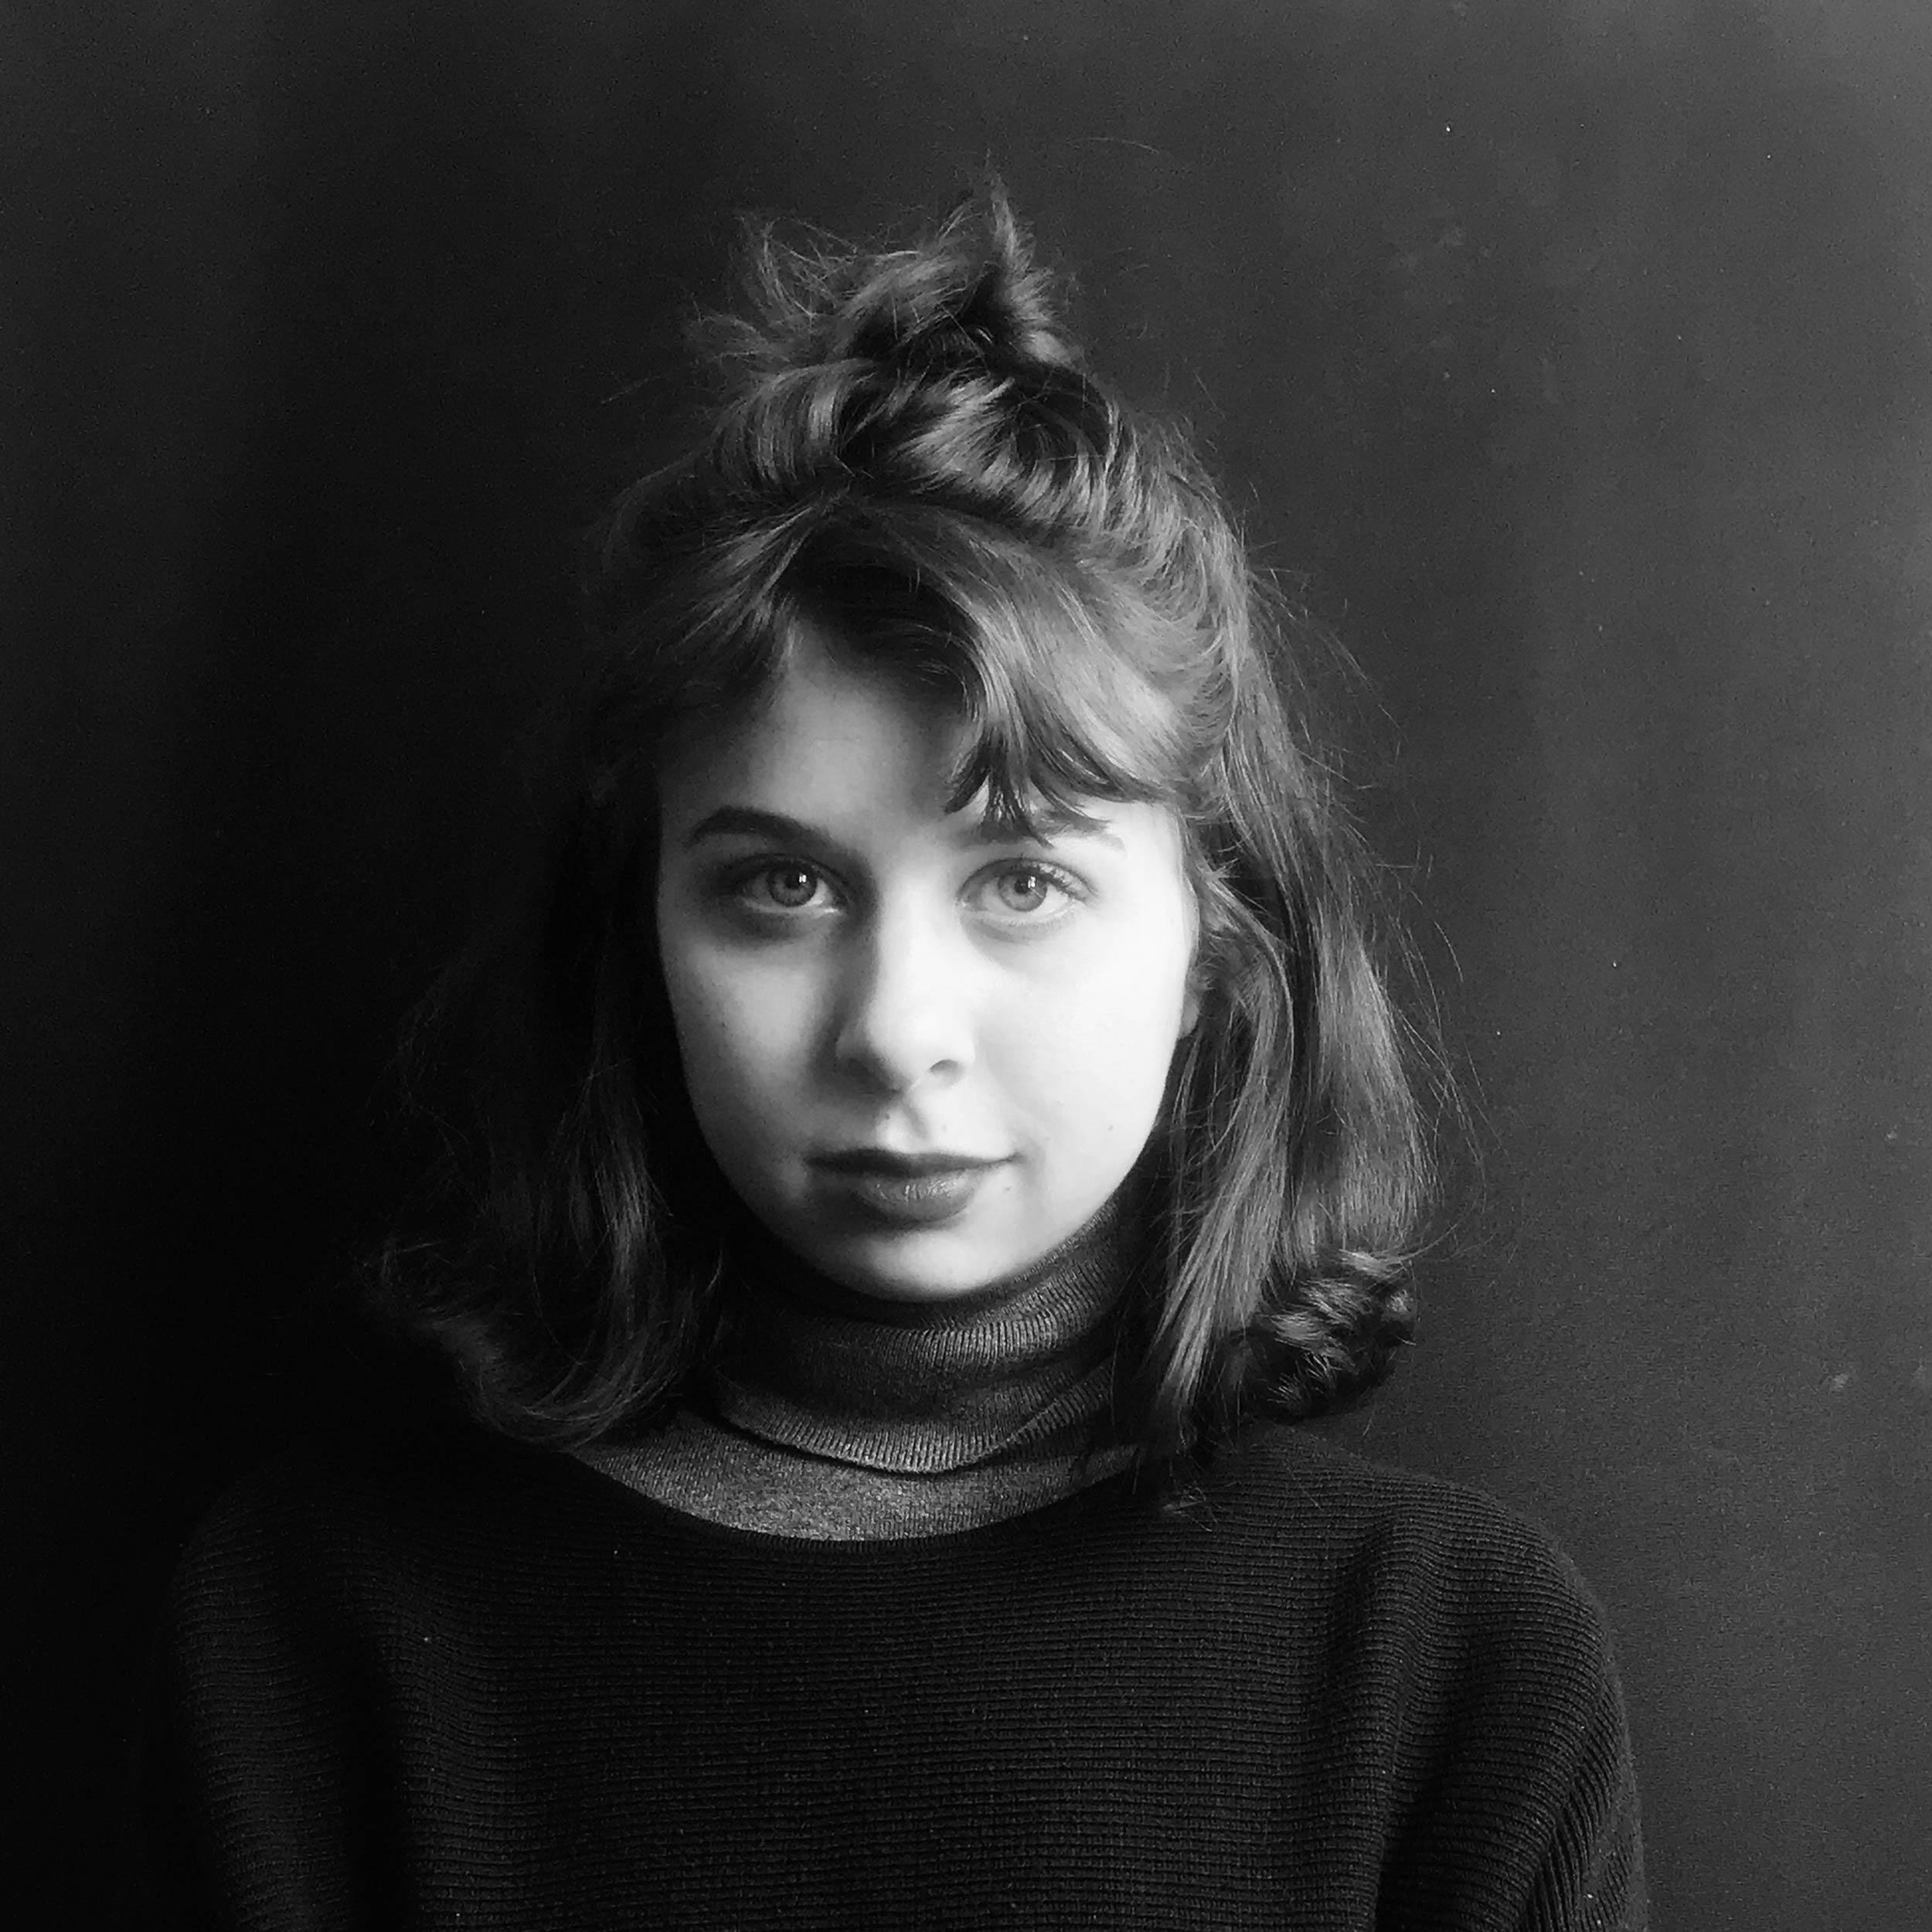 Anja Korherr